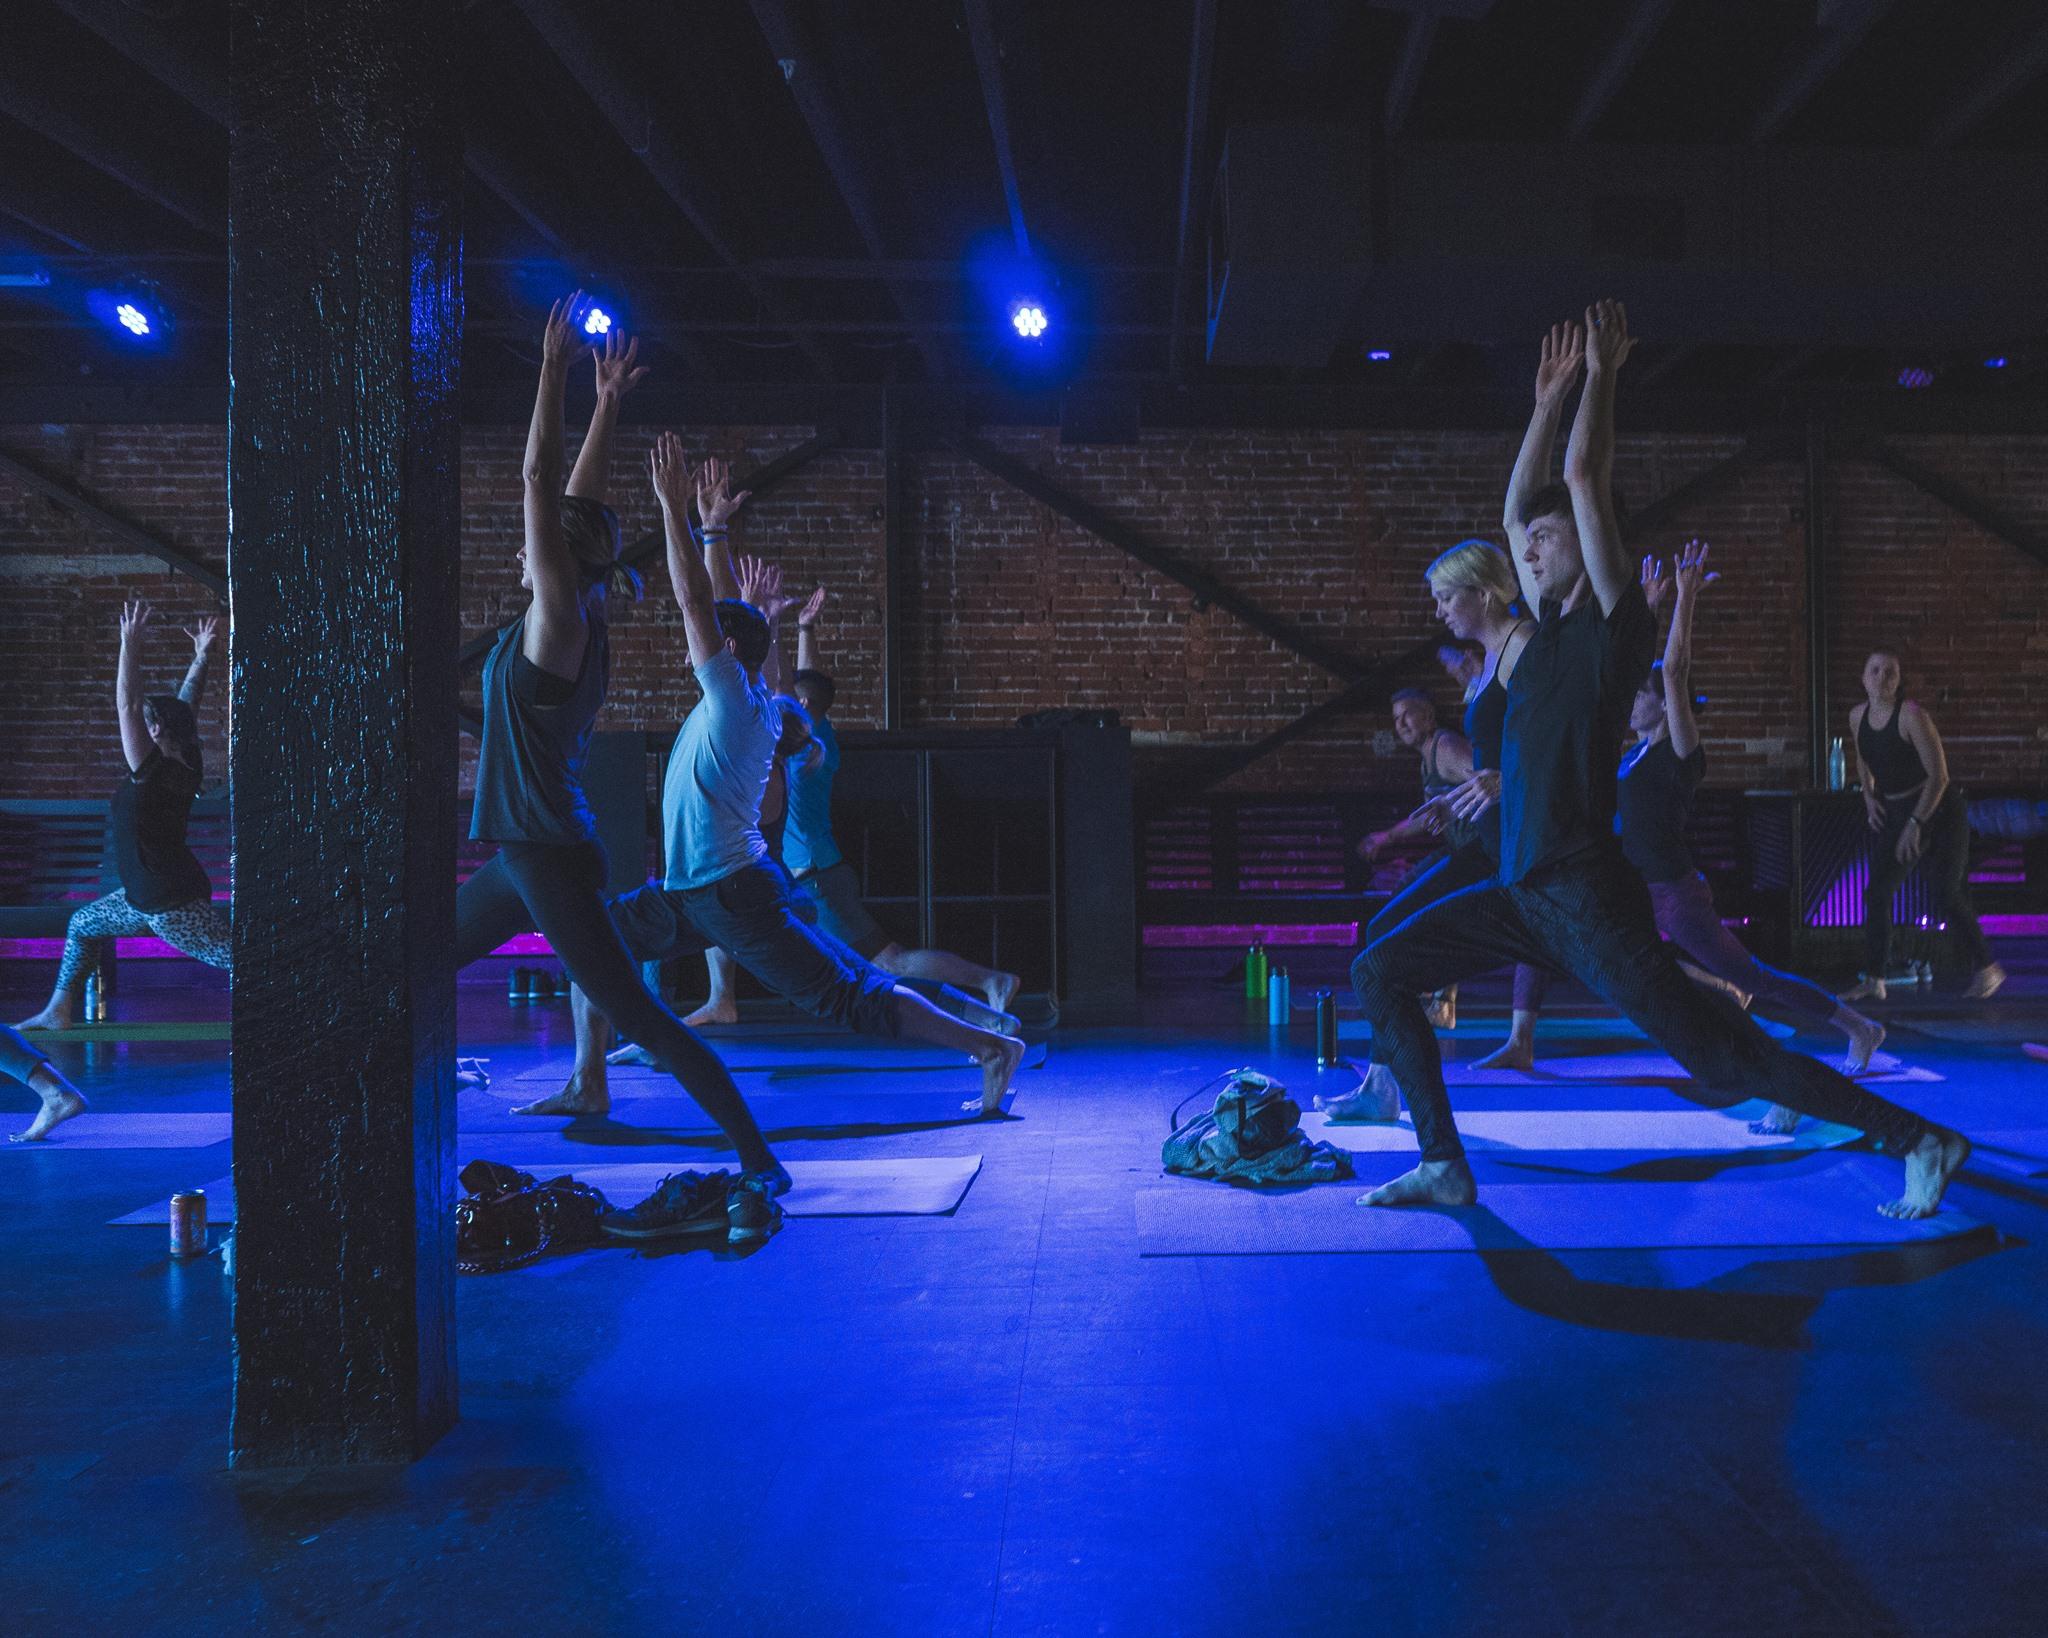 Fuel Yoga Workouts Downtown Portland Heated  Yoga Power Vinyasa 826 SW 2nd Ave Portland Oregon 97204 971-213-3835 Healthy Hour 1.jpg